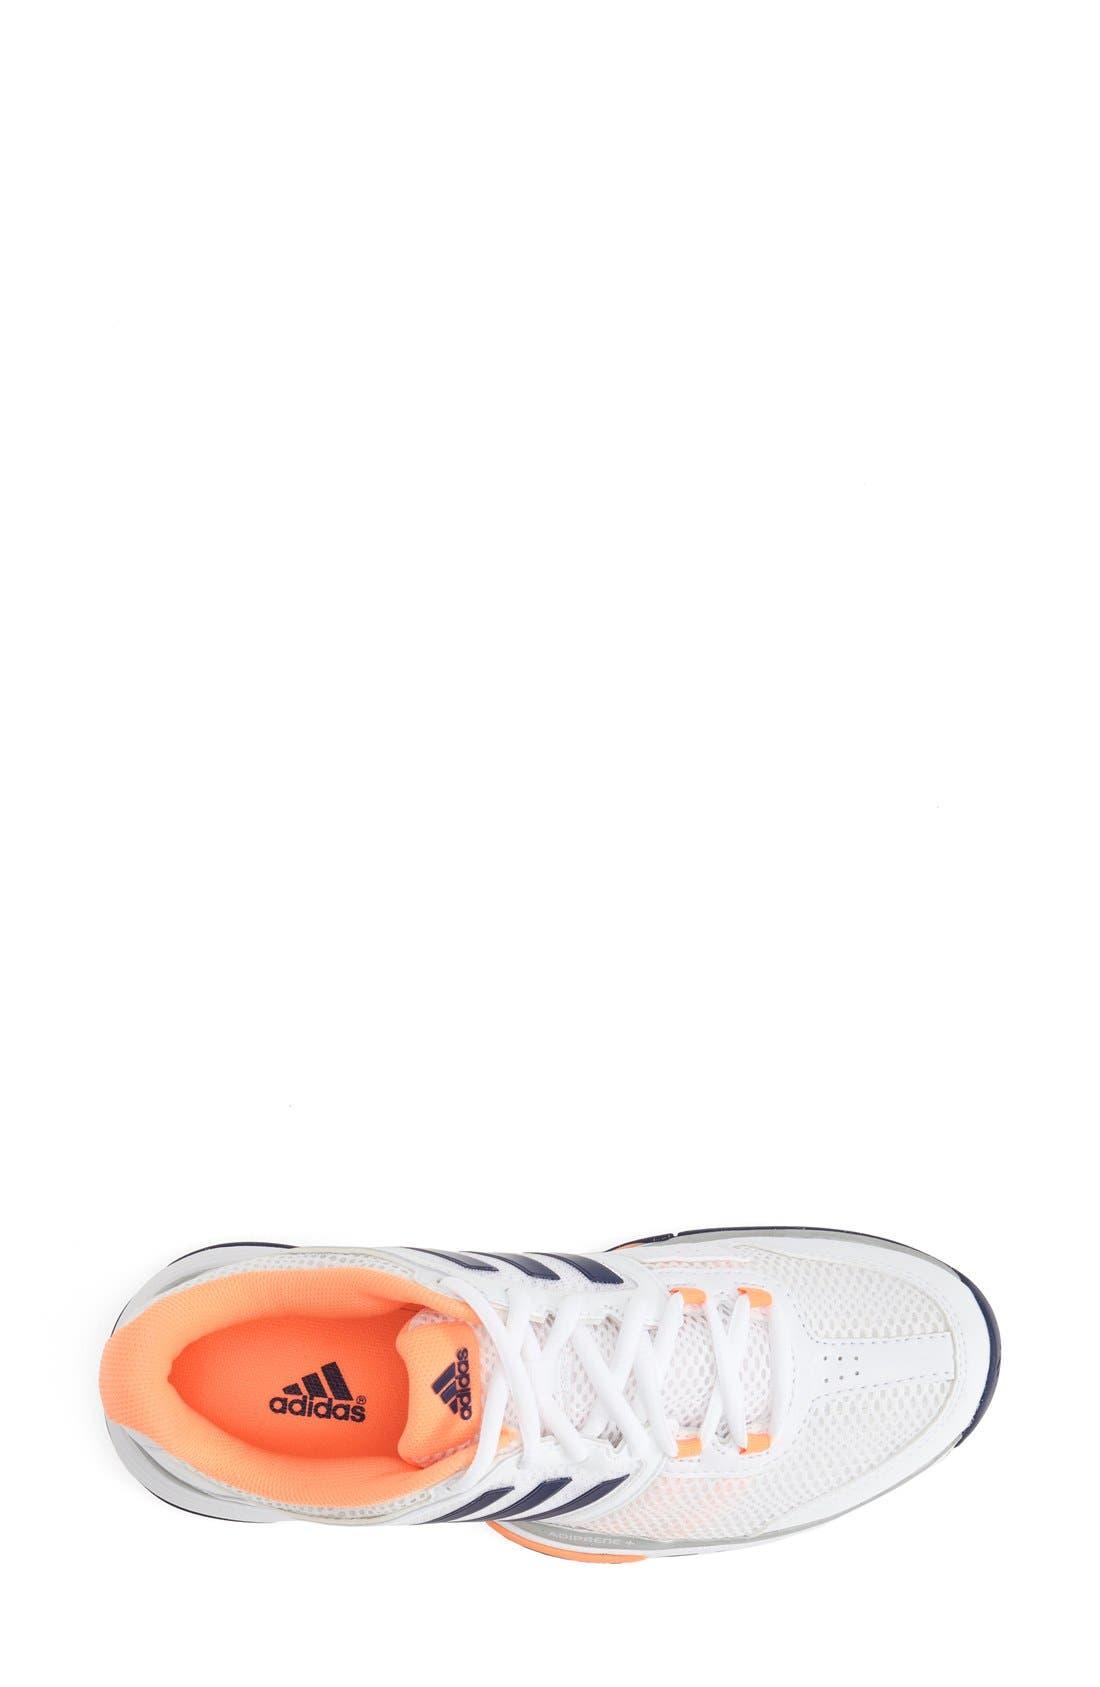 Alternate Image 3  - adidas 'adiPower Barricade Team 4' Tennis Shoe (Women)